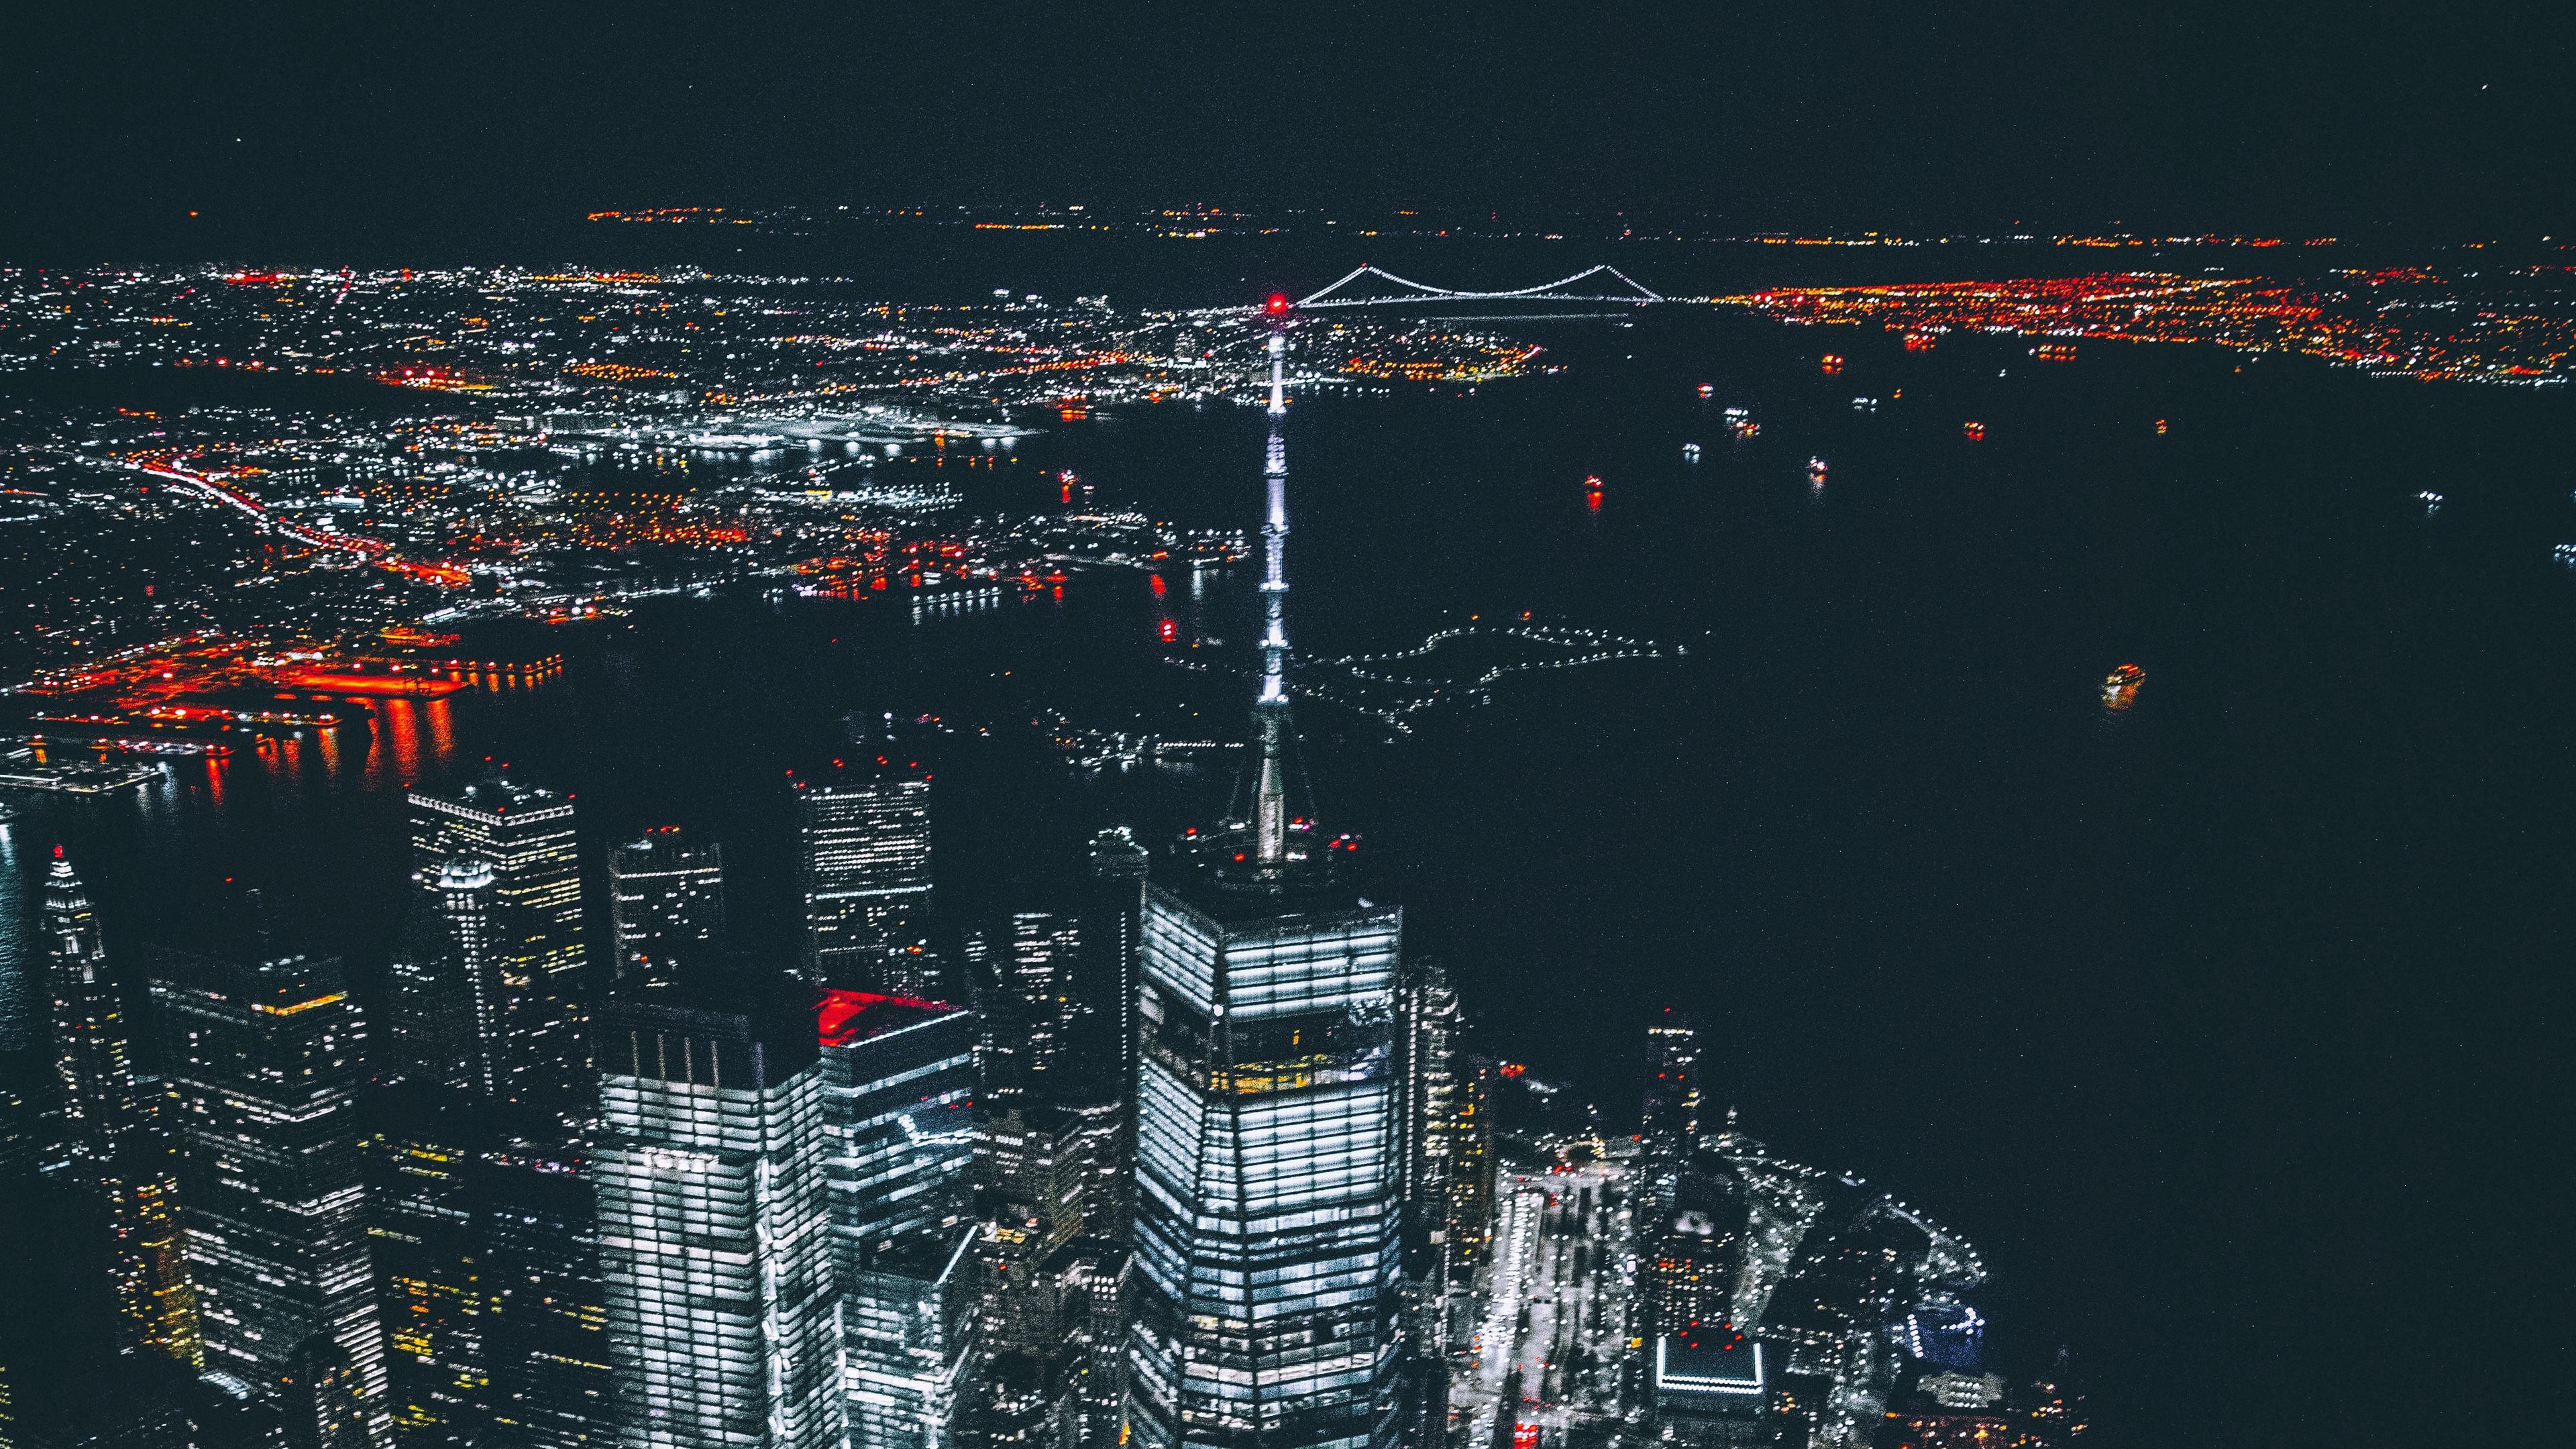 skyscrapers night city new york usa 4k 1538066154 - skyscrapers, night city, new york, usa 4k - Skyscrapers, night city, new york